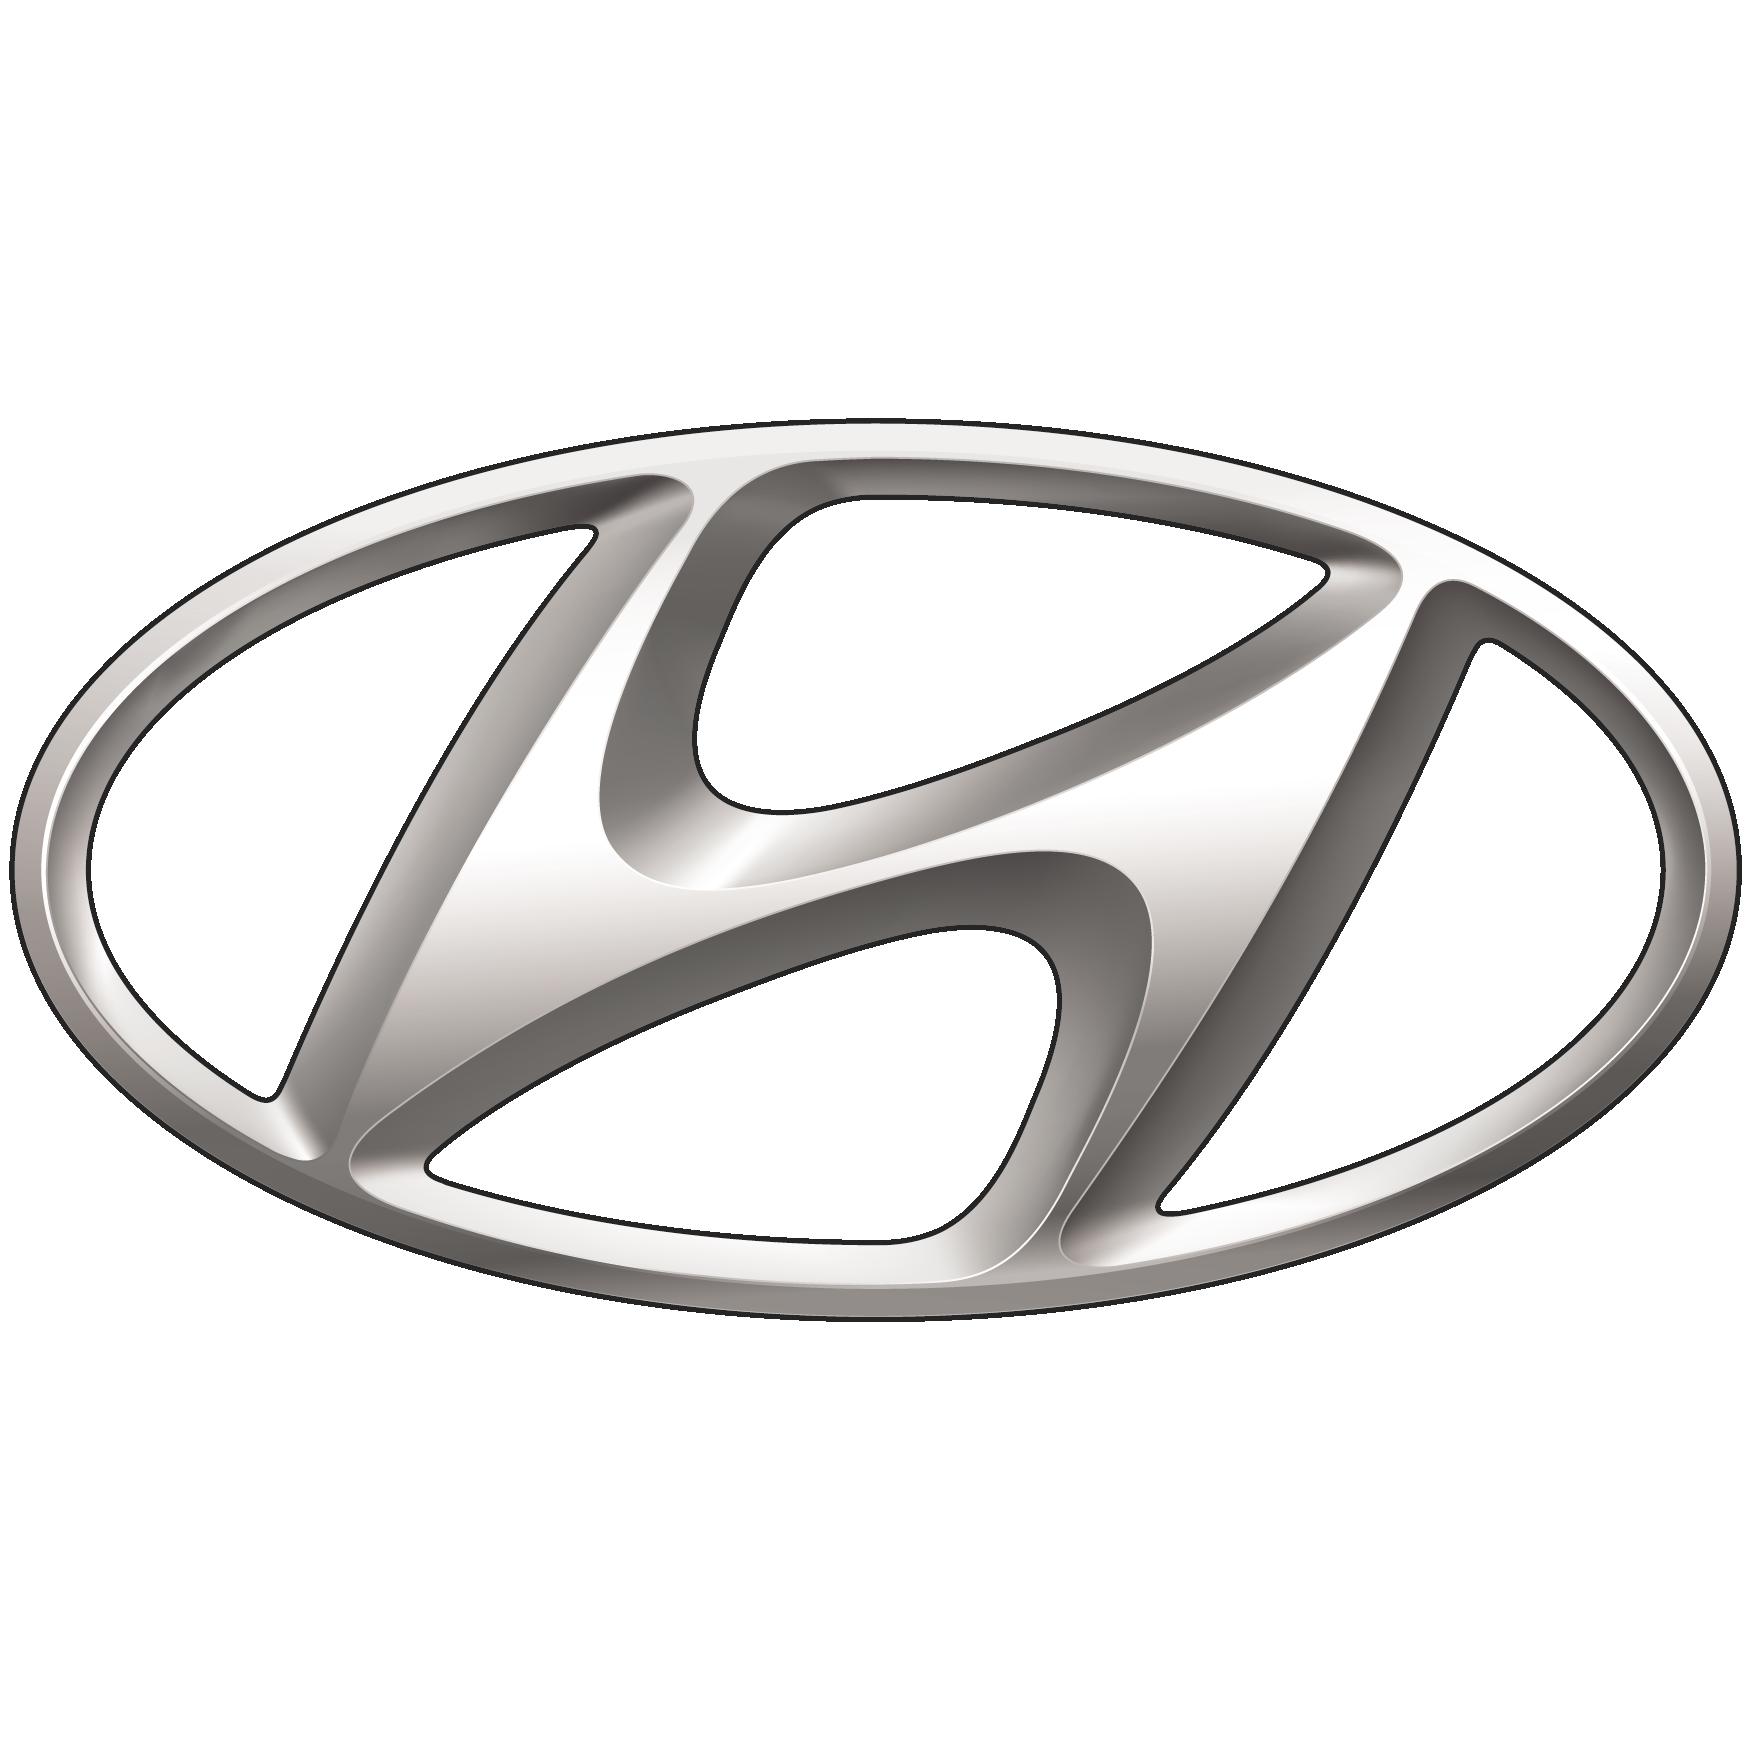 Hyundai alternative navigation | Mena co | Alternative